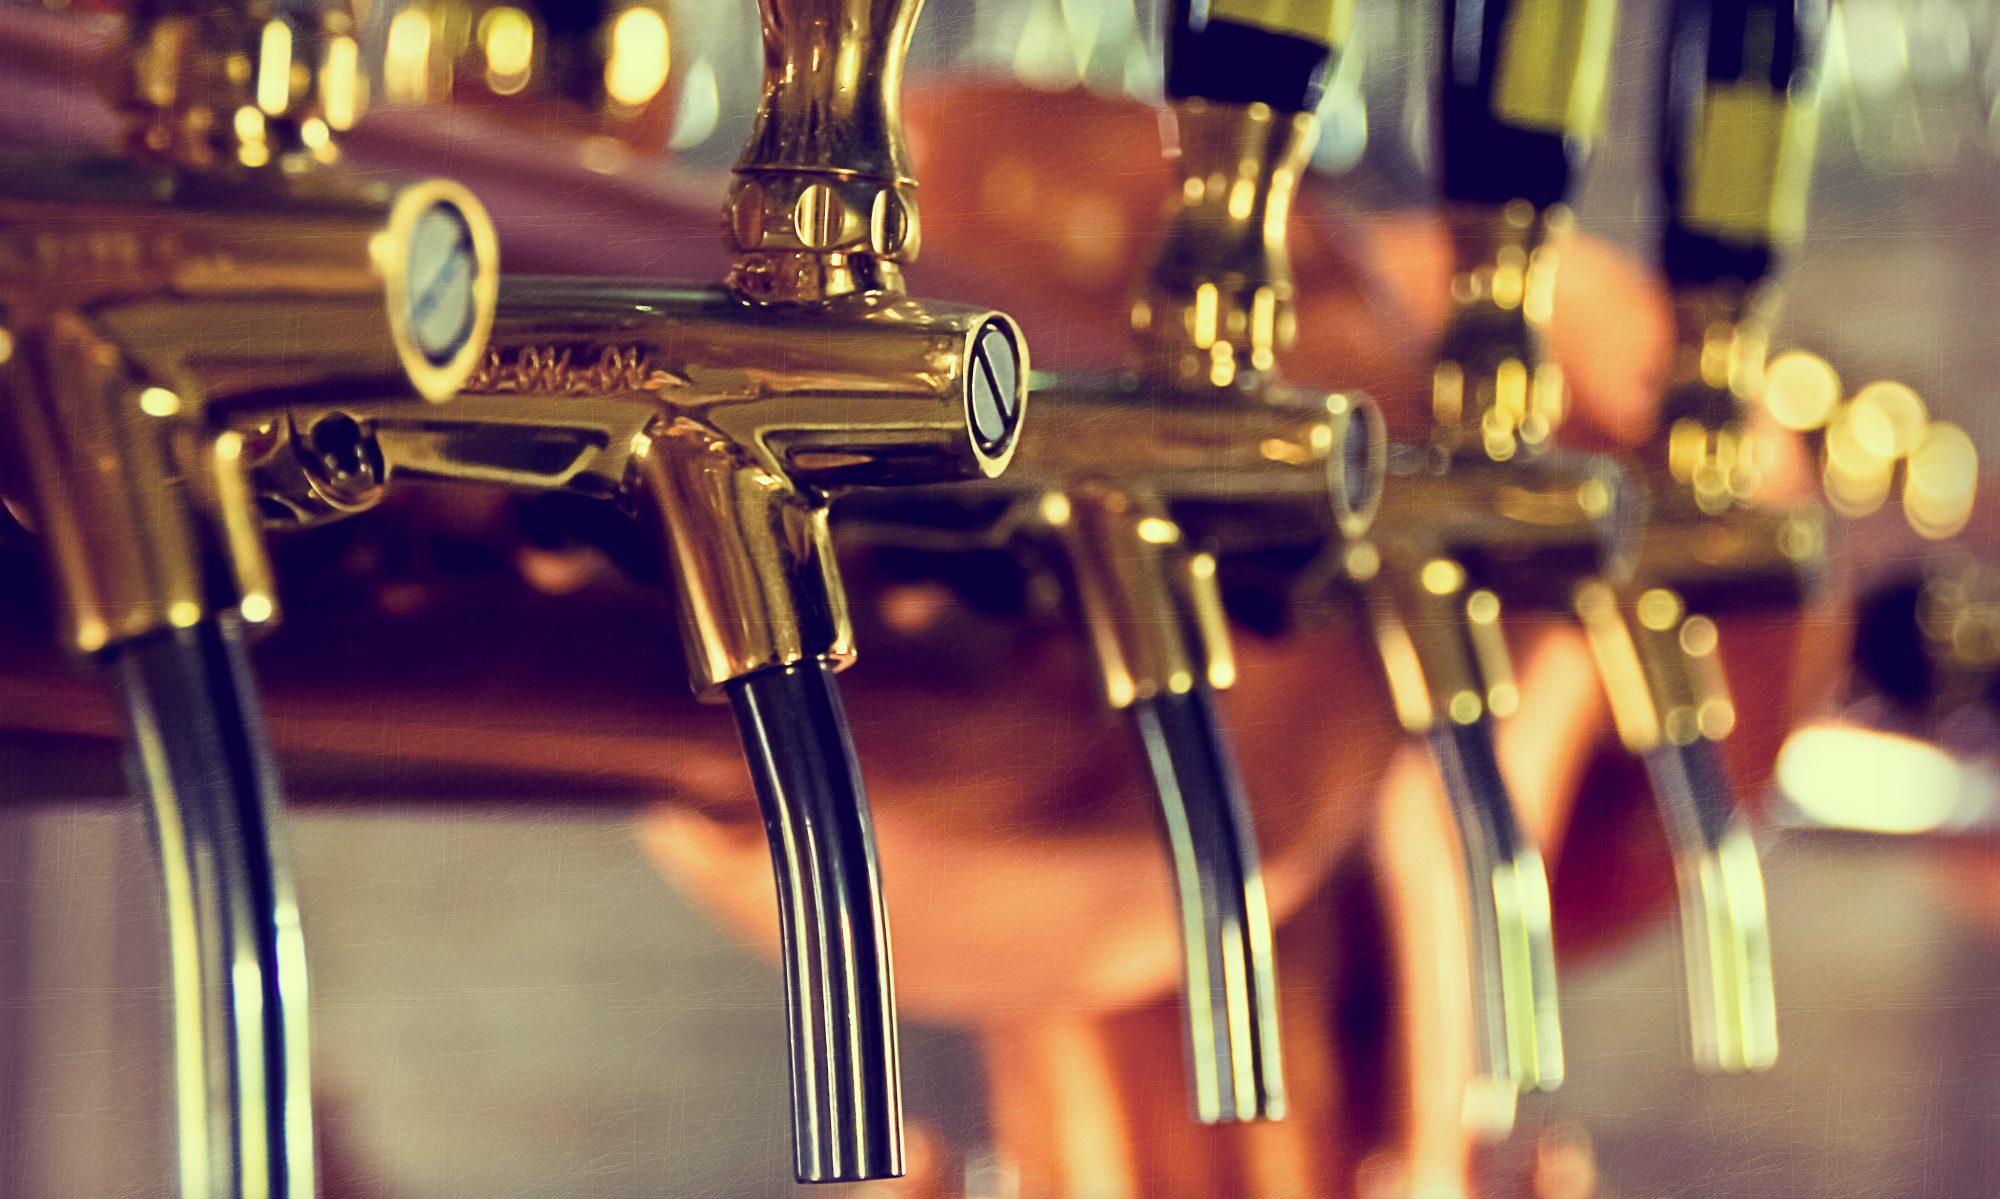 Baynhams Brewery